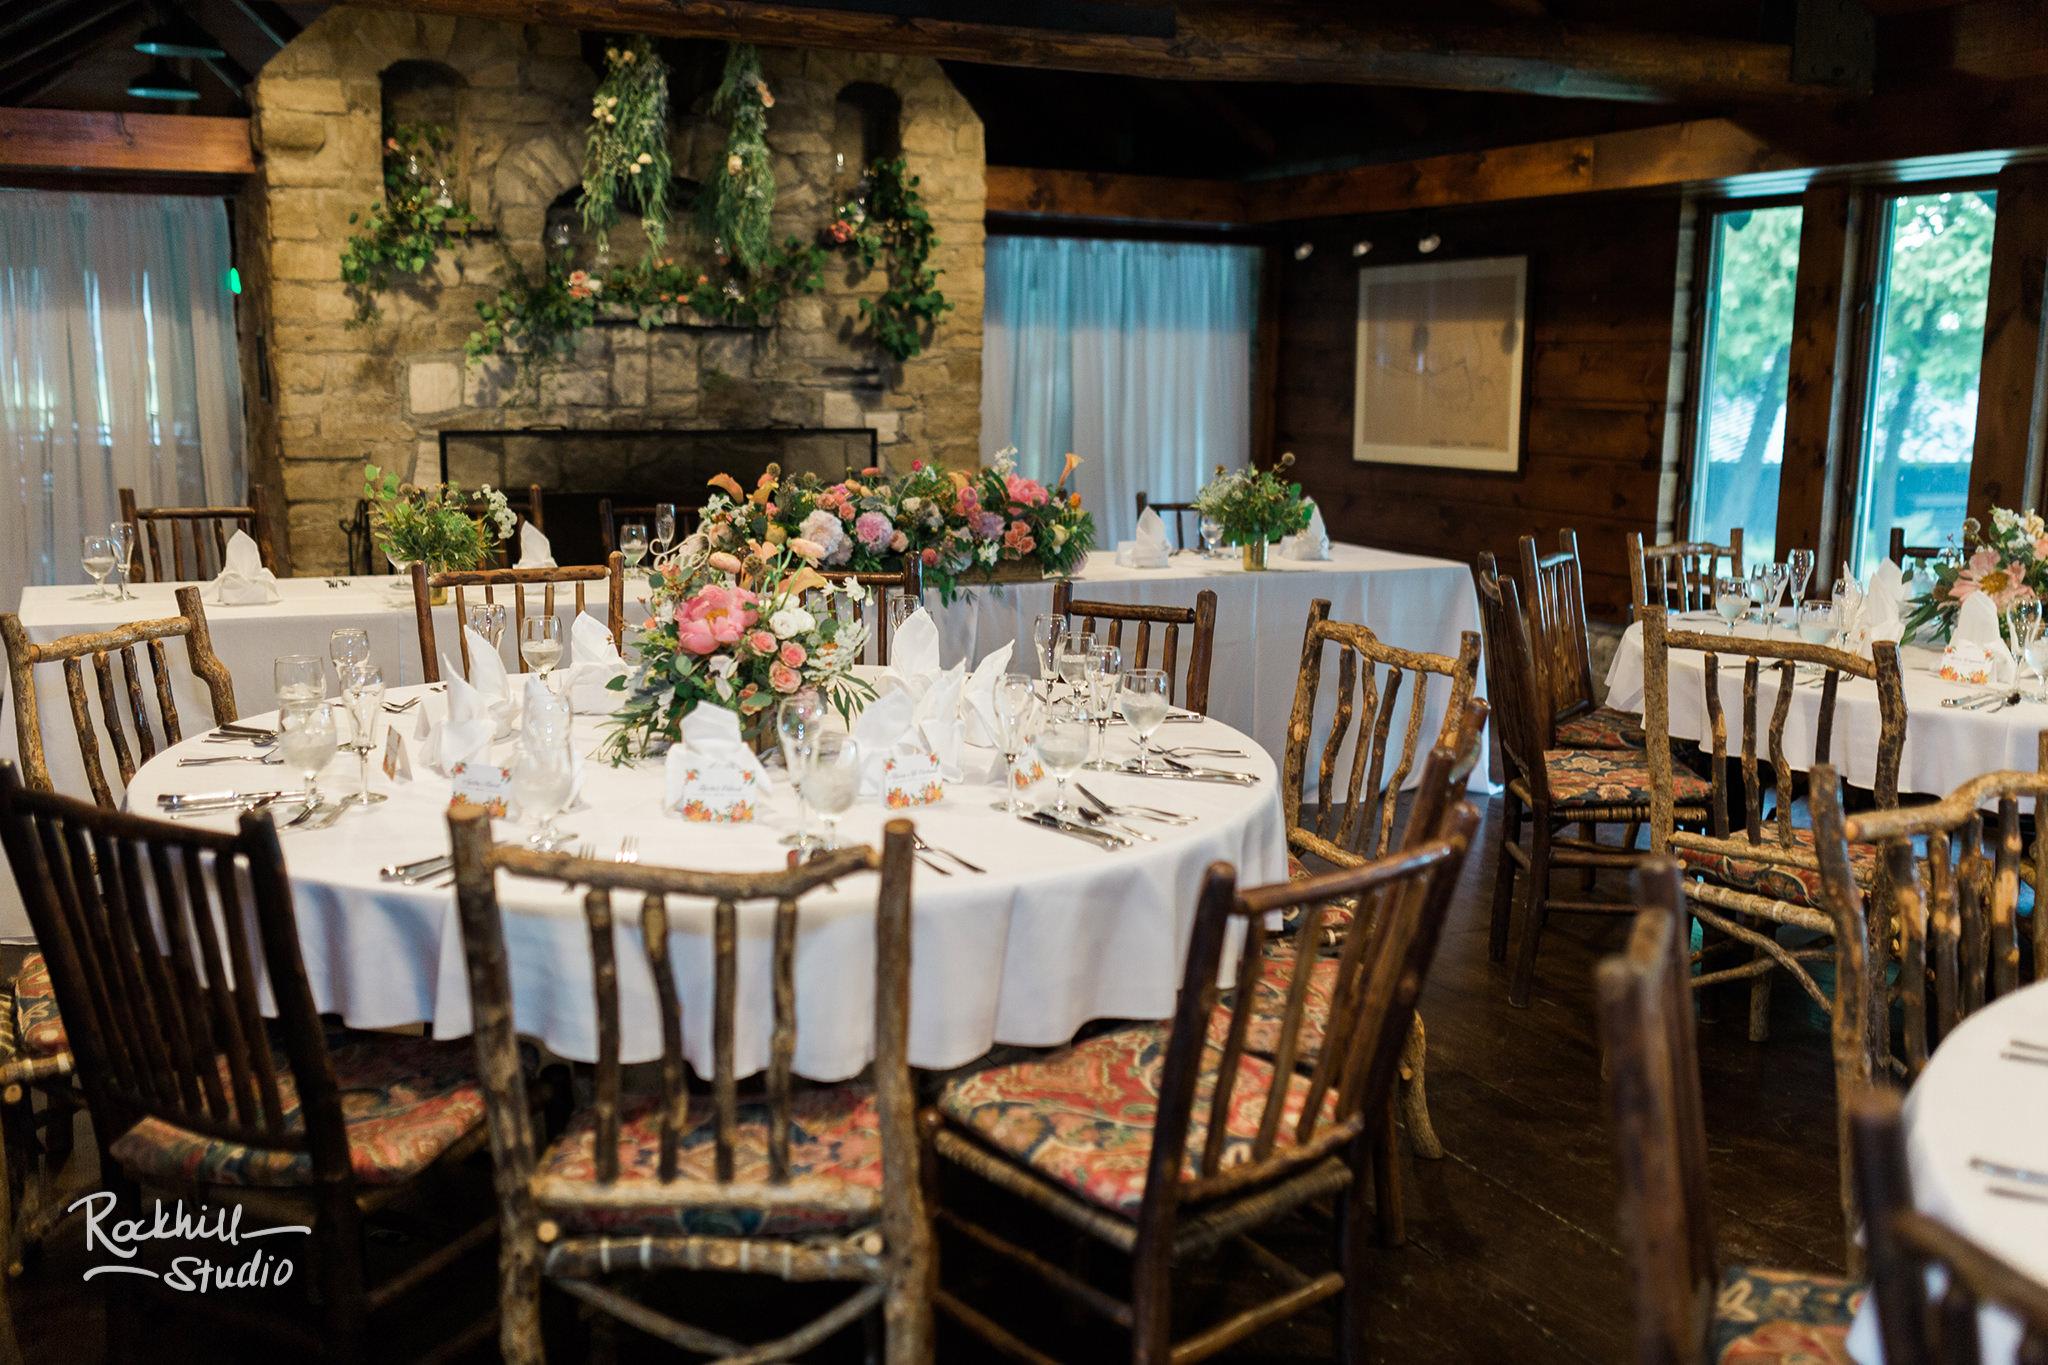 Drummond Island Wedding, reception tables,Traverse City Wedding Photographer Rockhill Studio